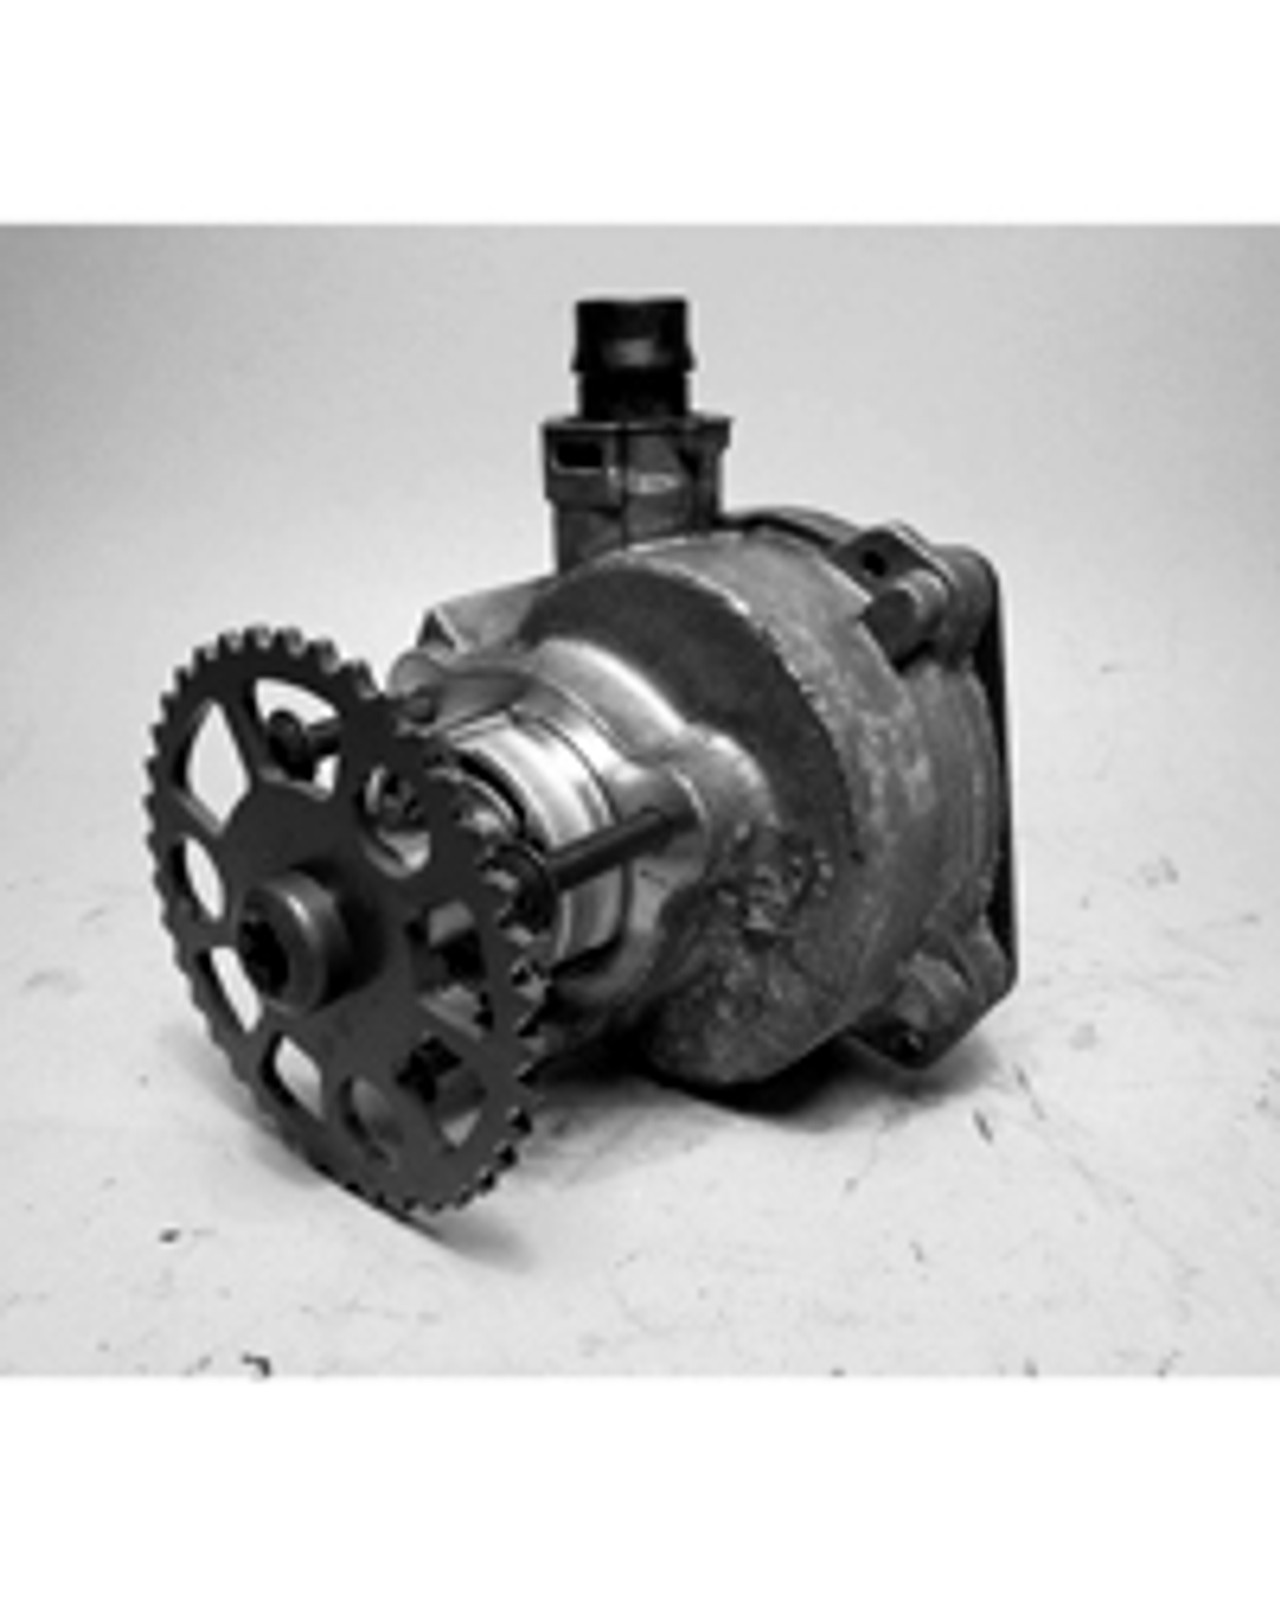 Engines & Components - Vacuum Pumps - Page 1 - Prussian Motors